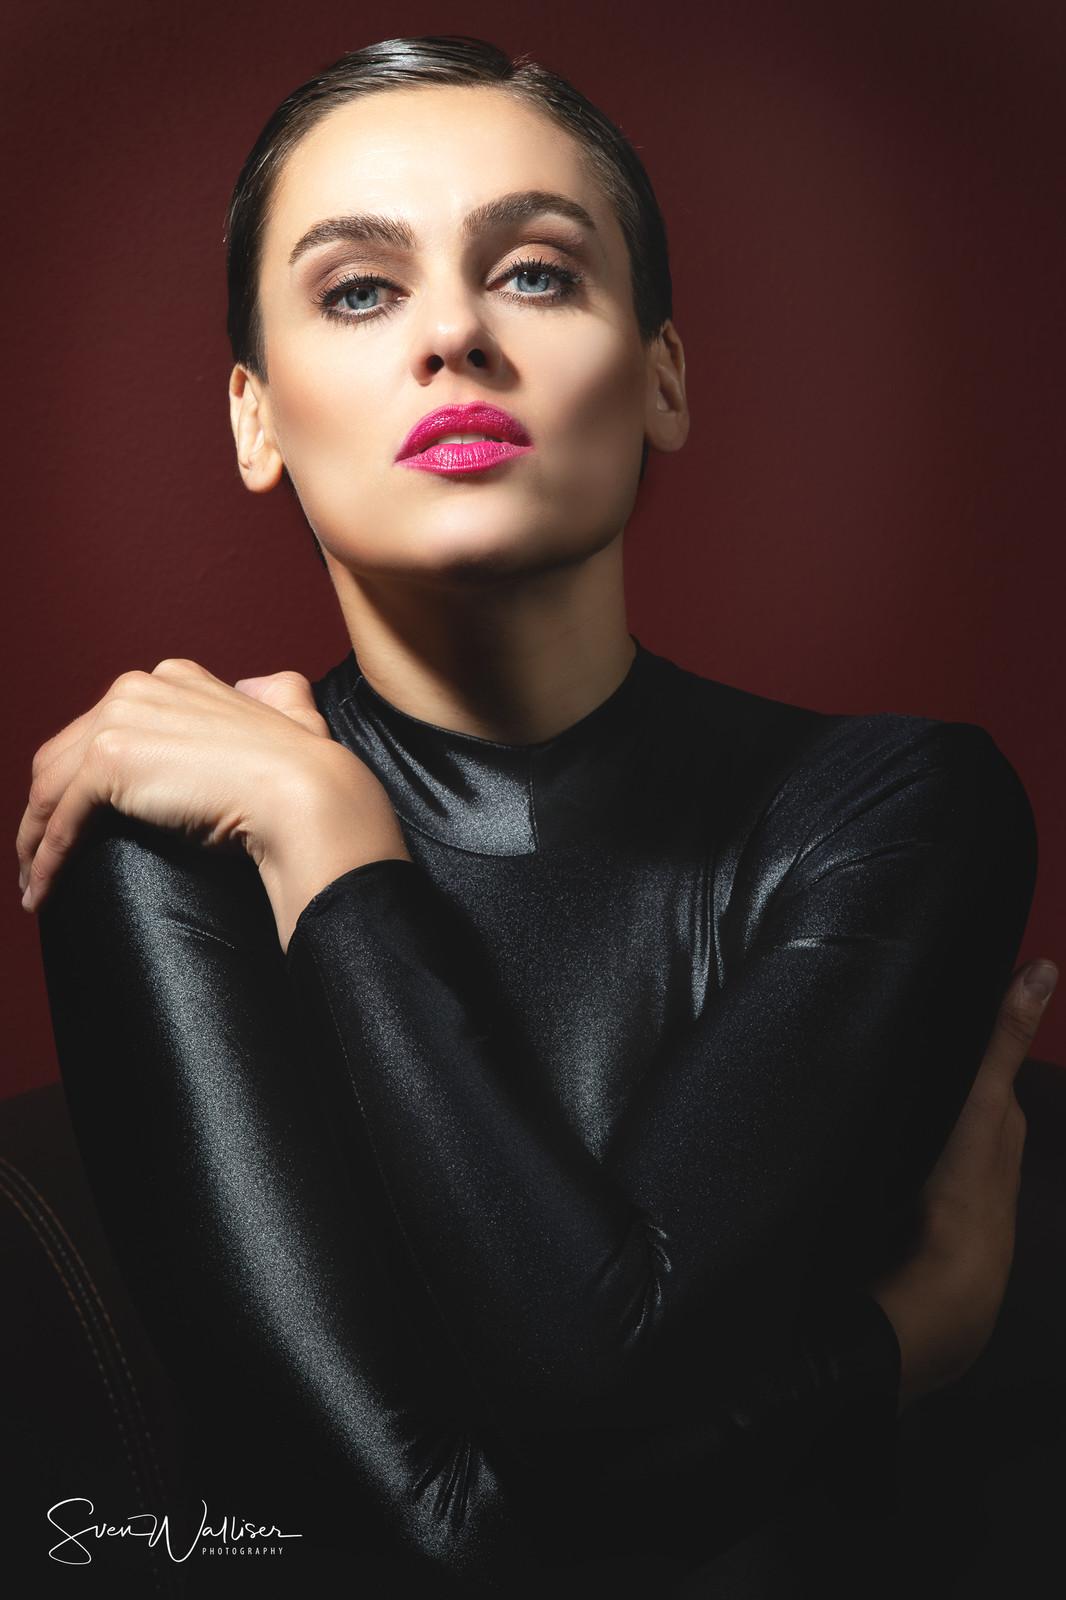 Paparazzi Natasha Legeyda nude photos 2019